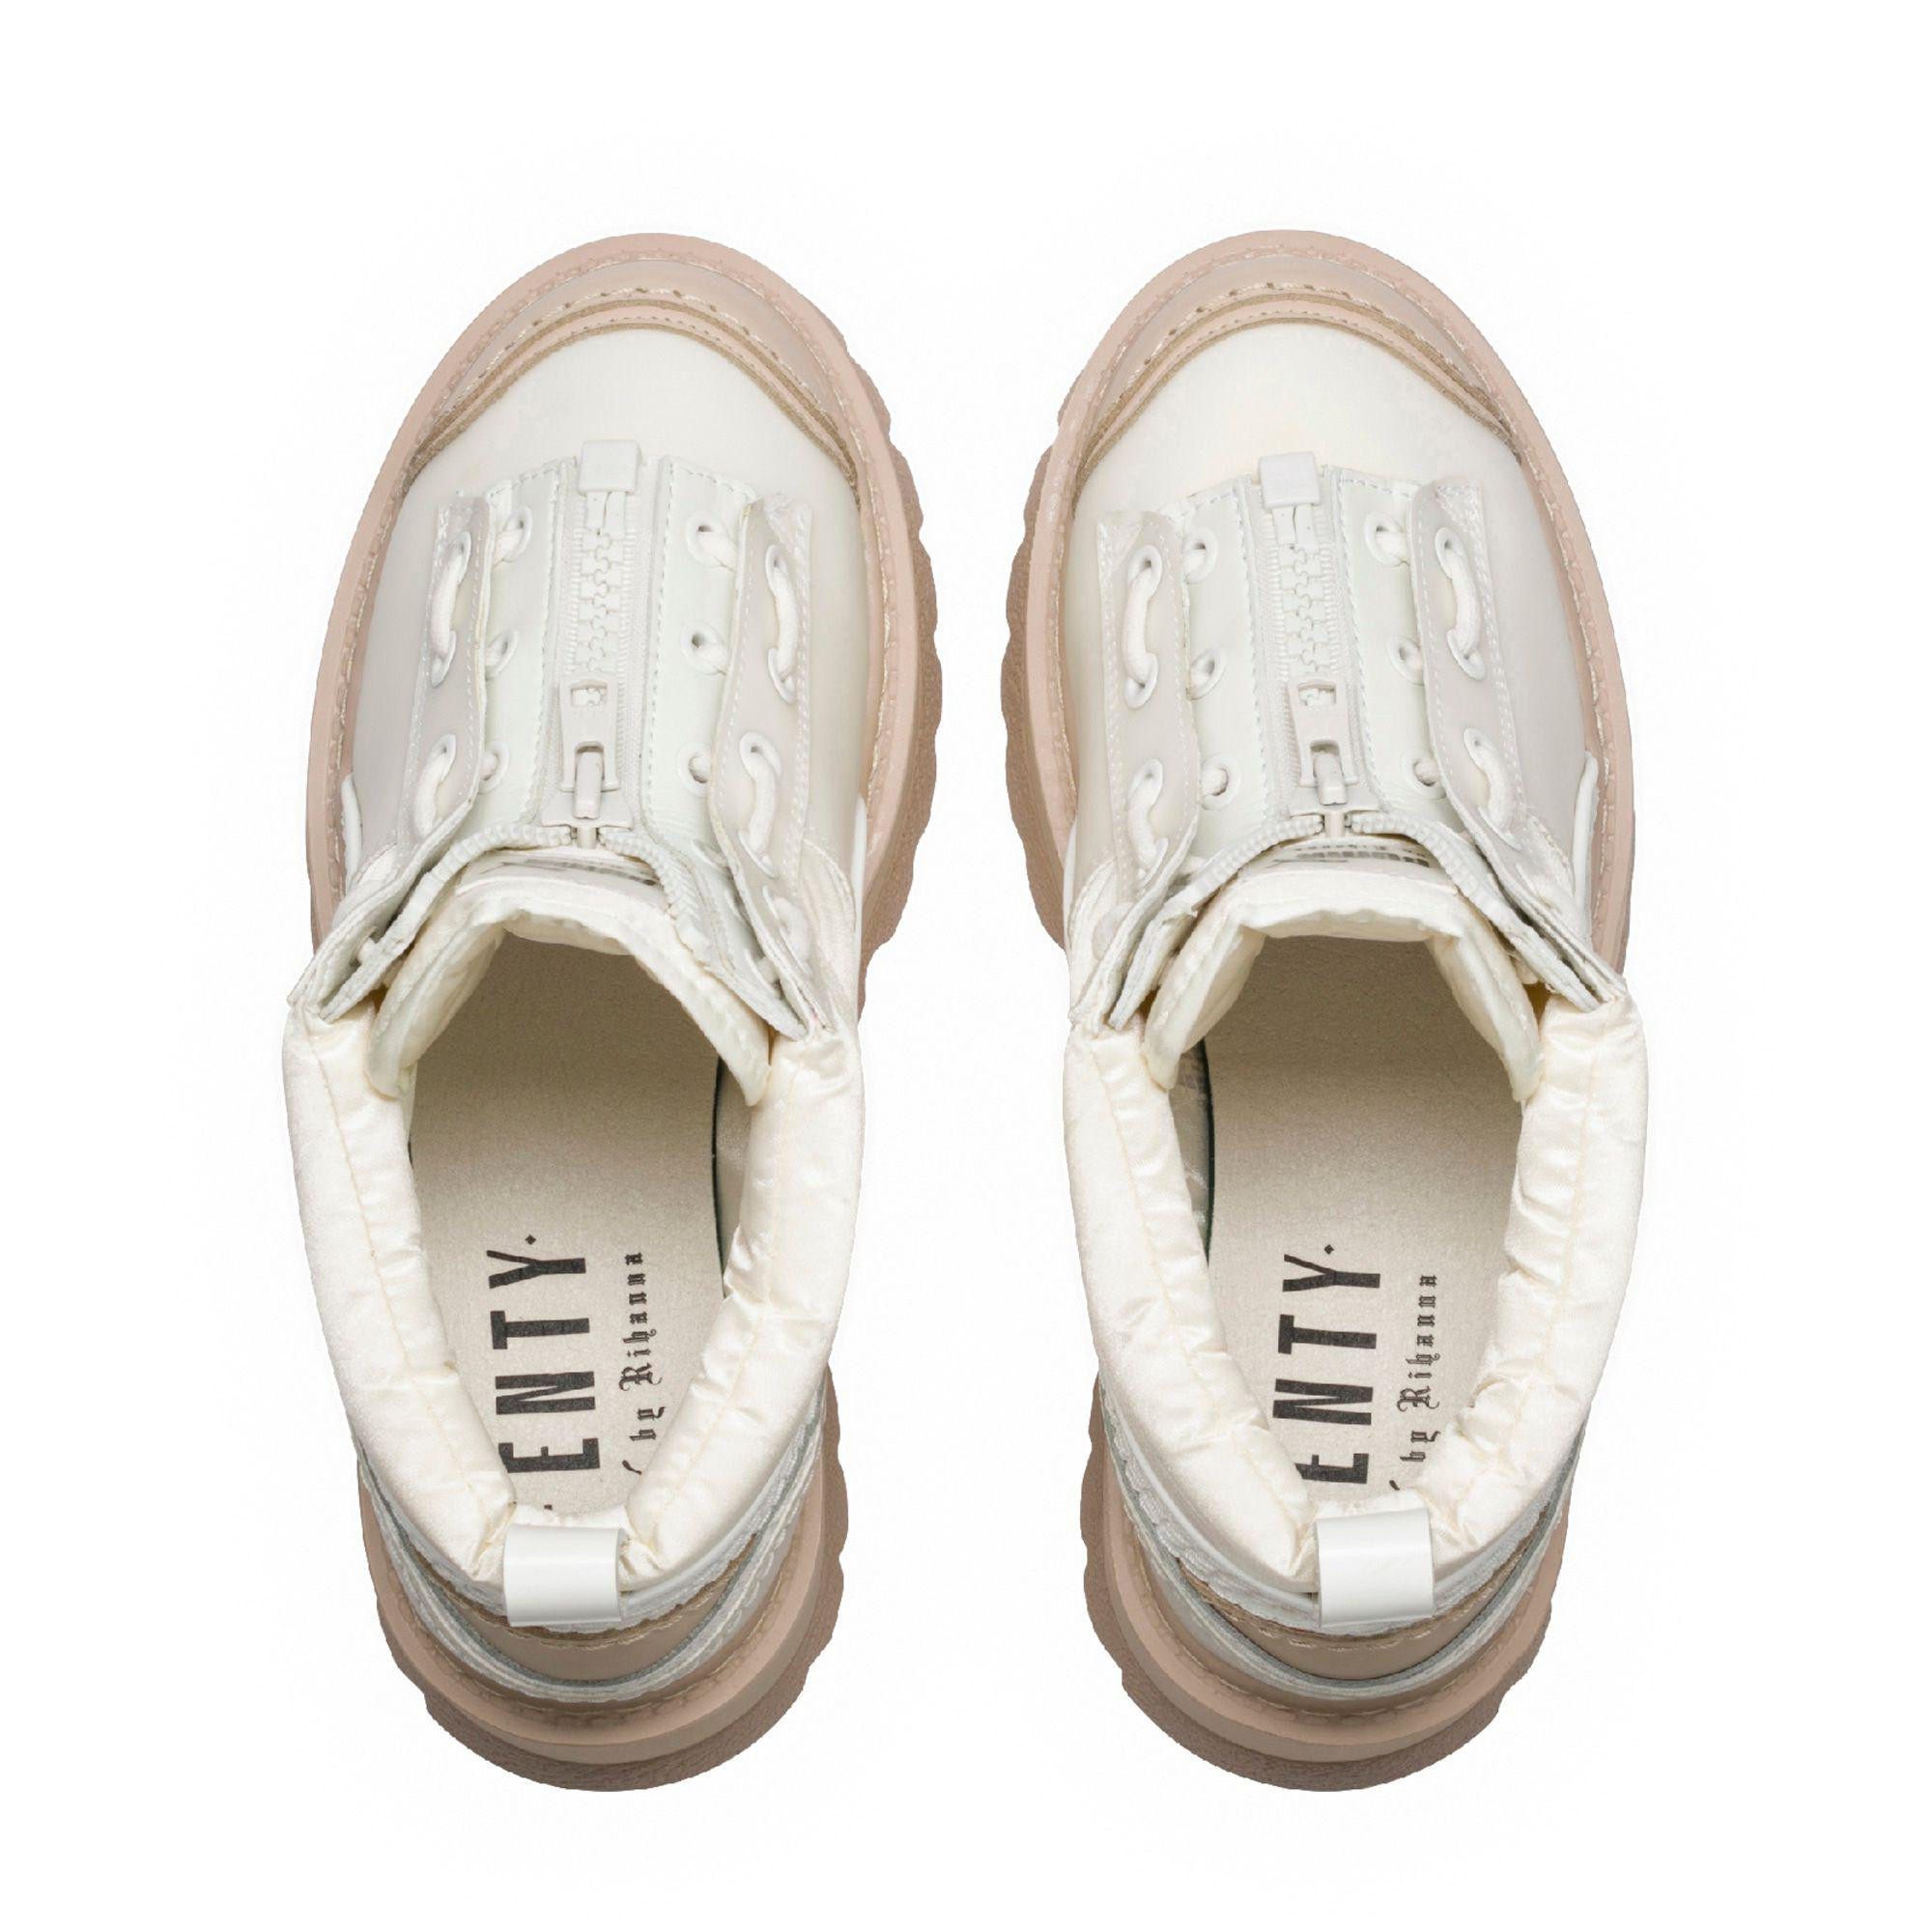 aba3948d79 PUMA Multicolor Zipped Women's Sneaker Boots